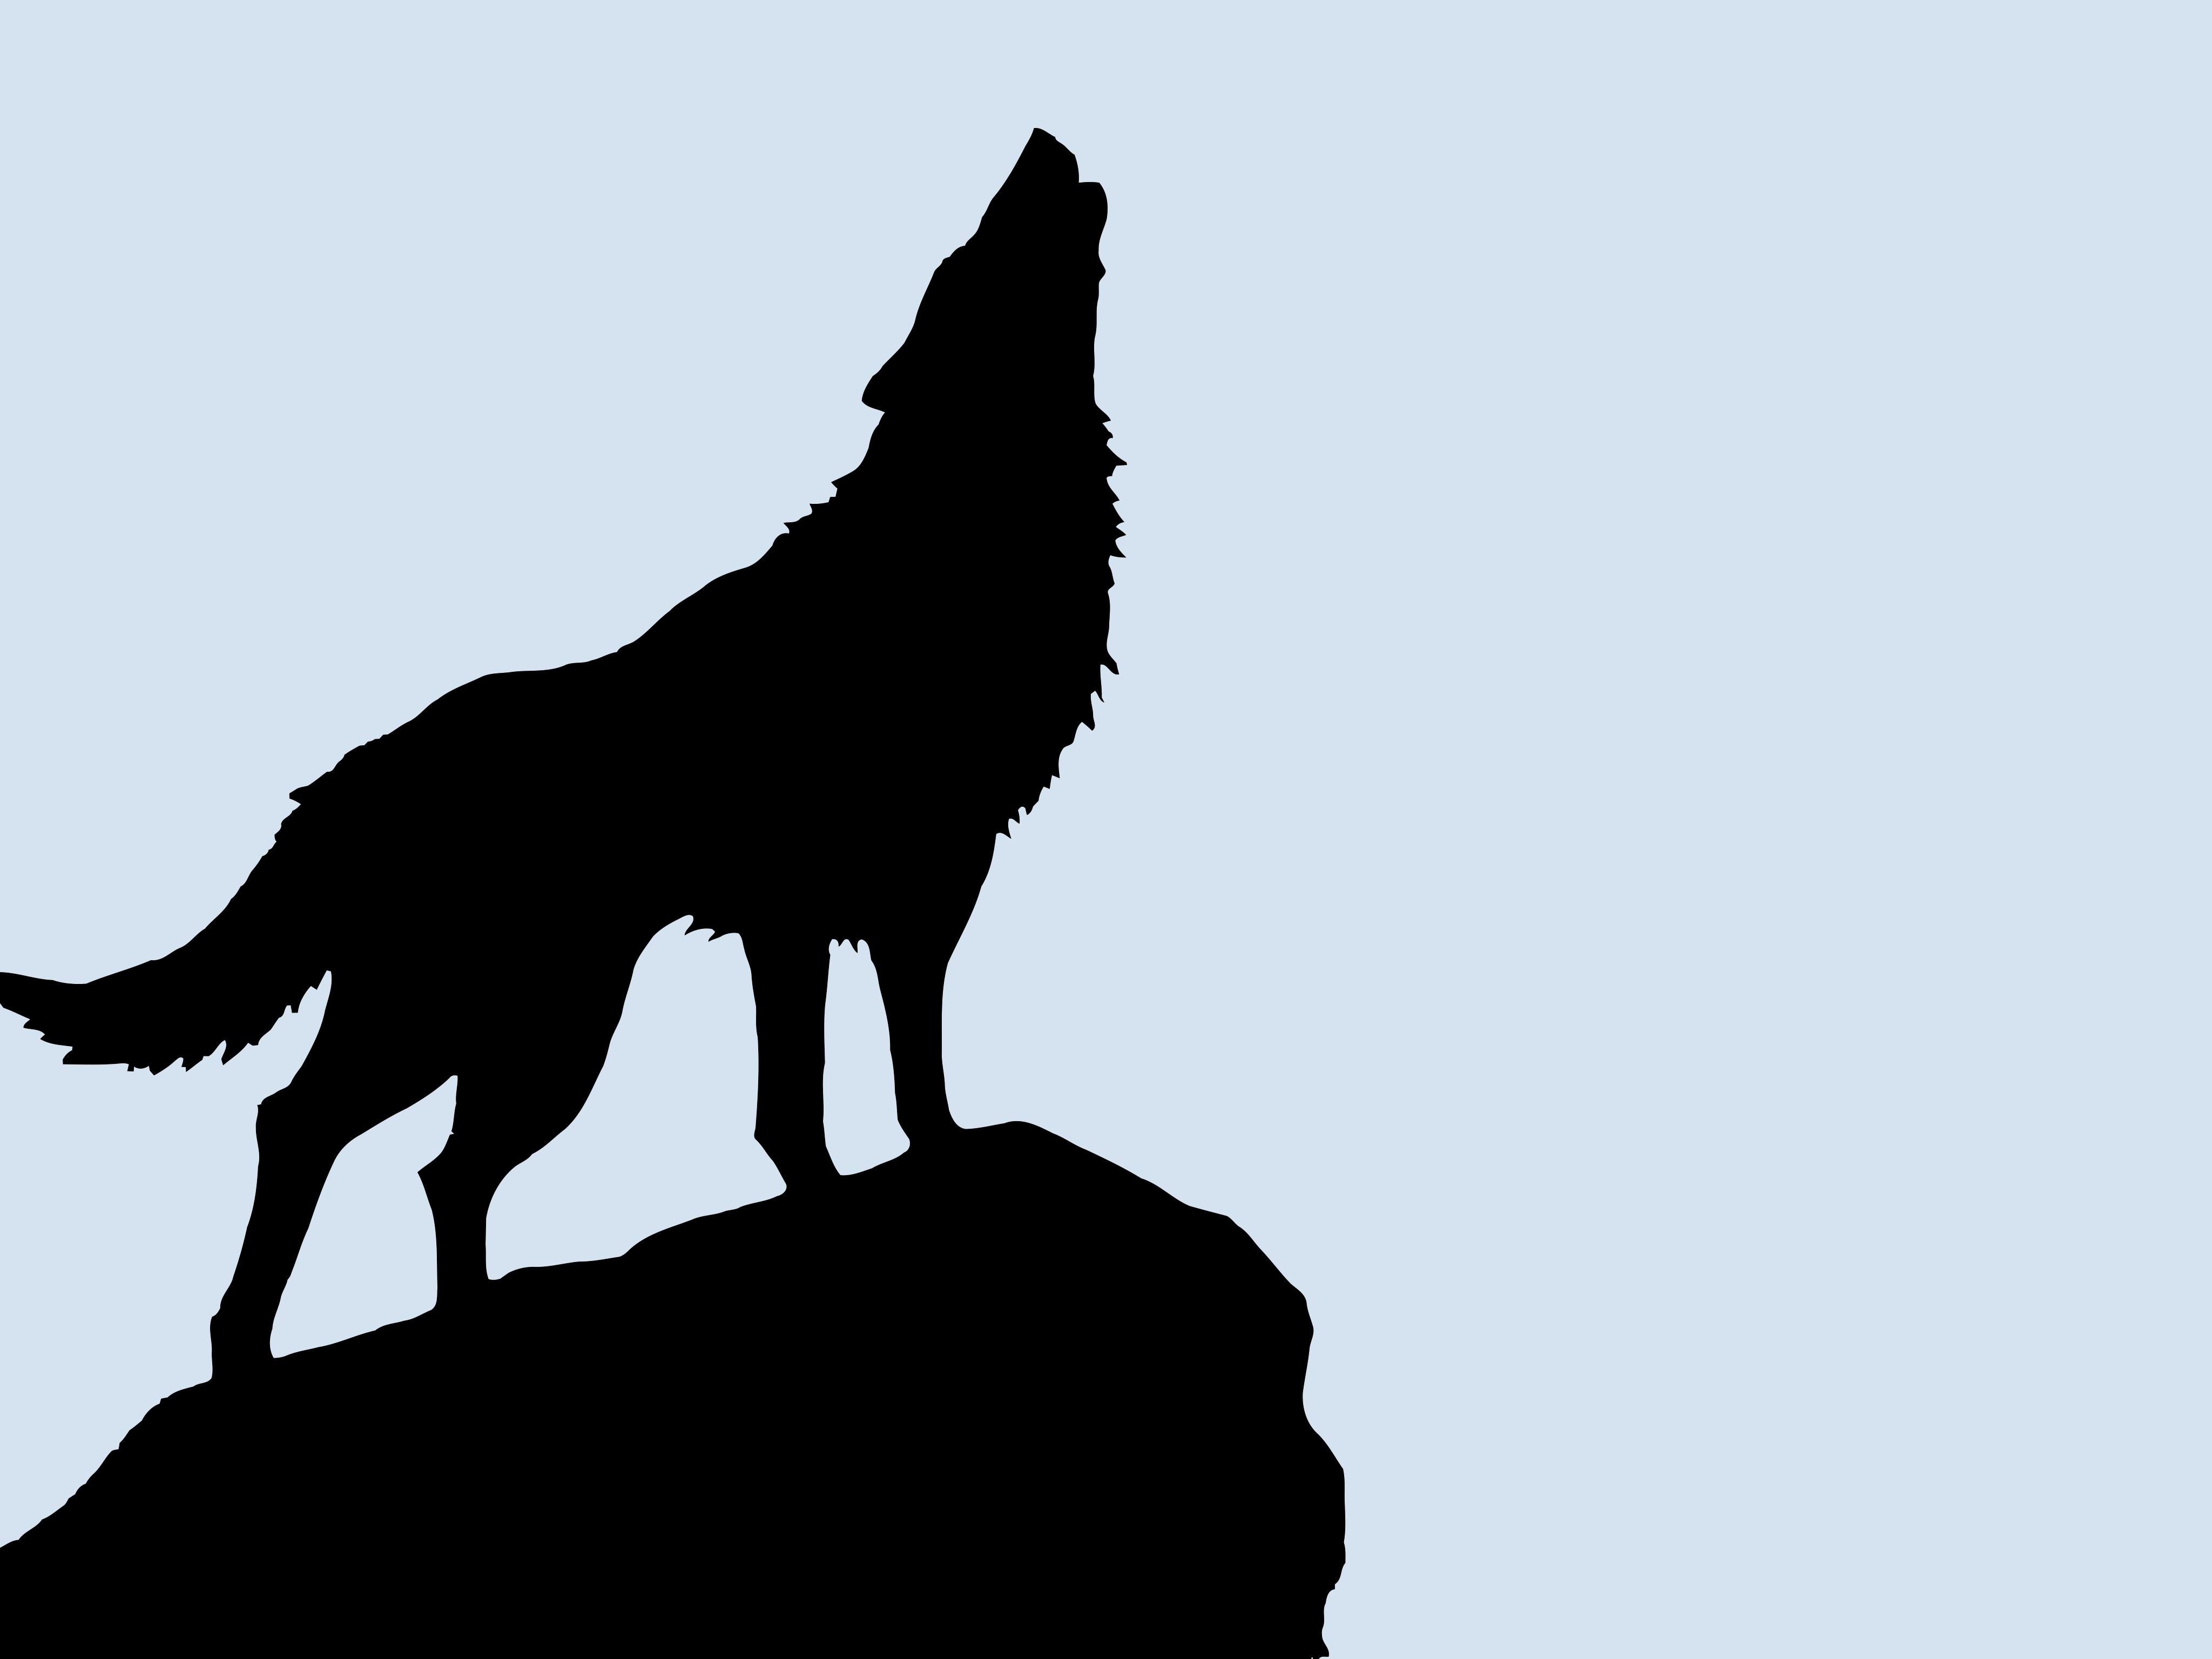 wolf vectorized silhouette art high resolution hd